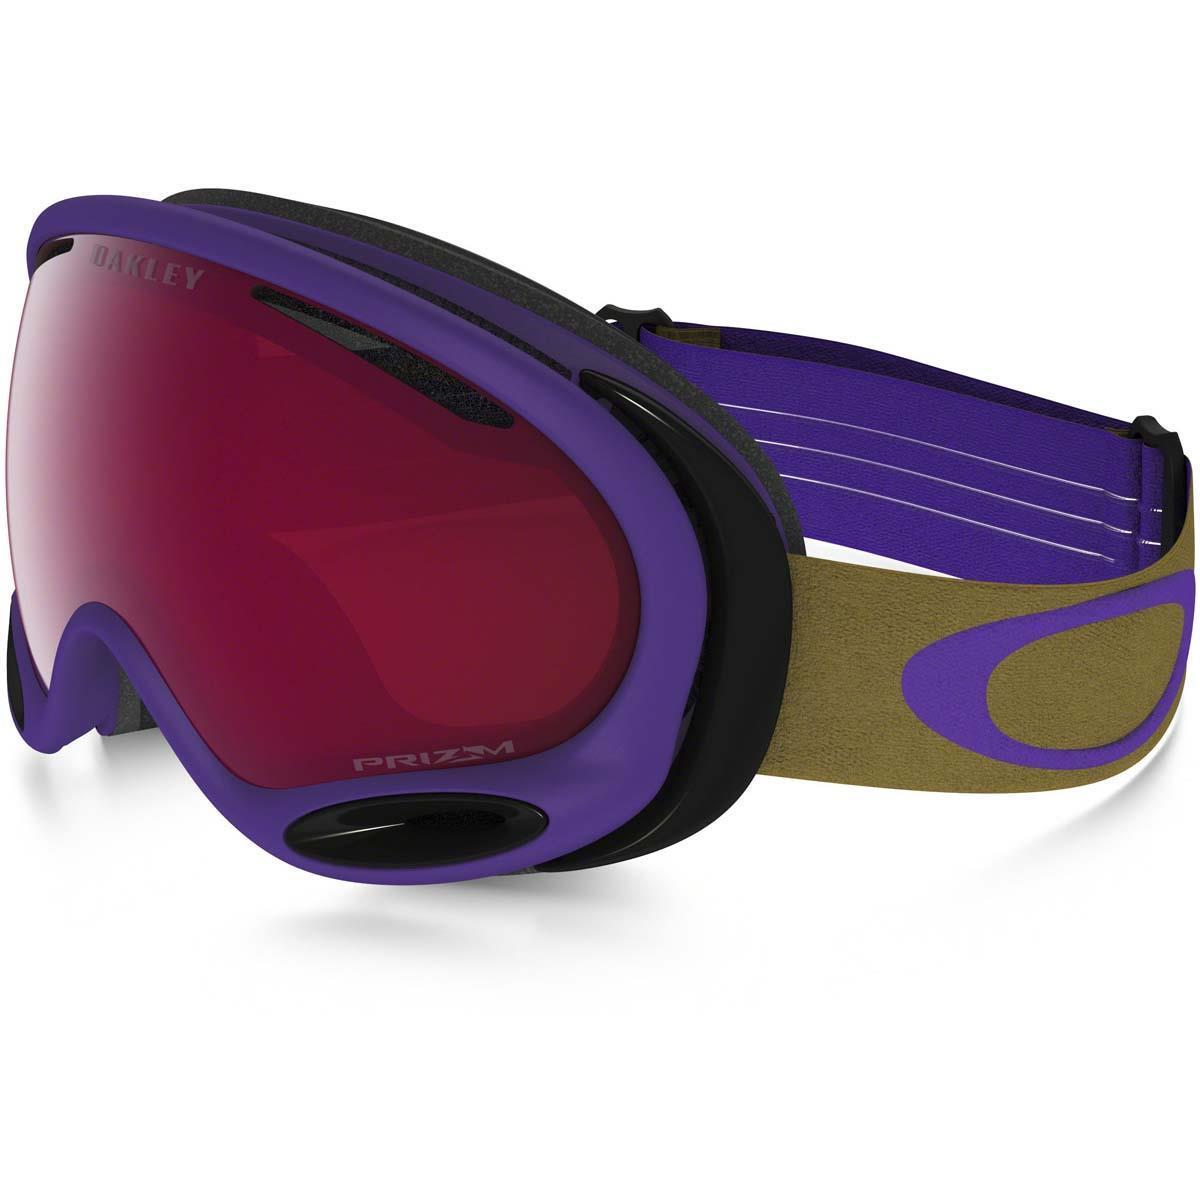 414e1f361dc Oakley Prizm A Frame 2.0 Snow Goggles. Loading zoom